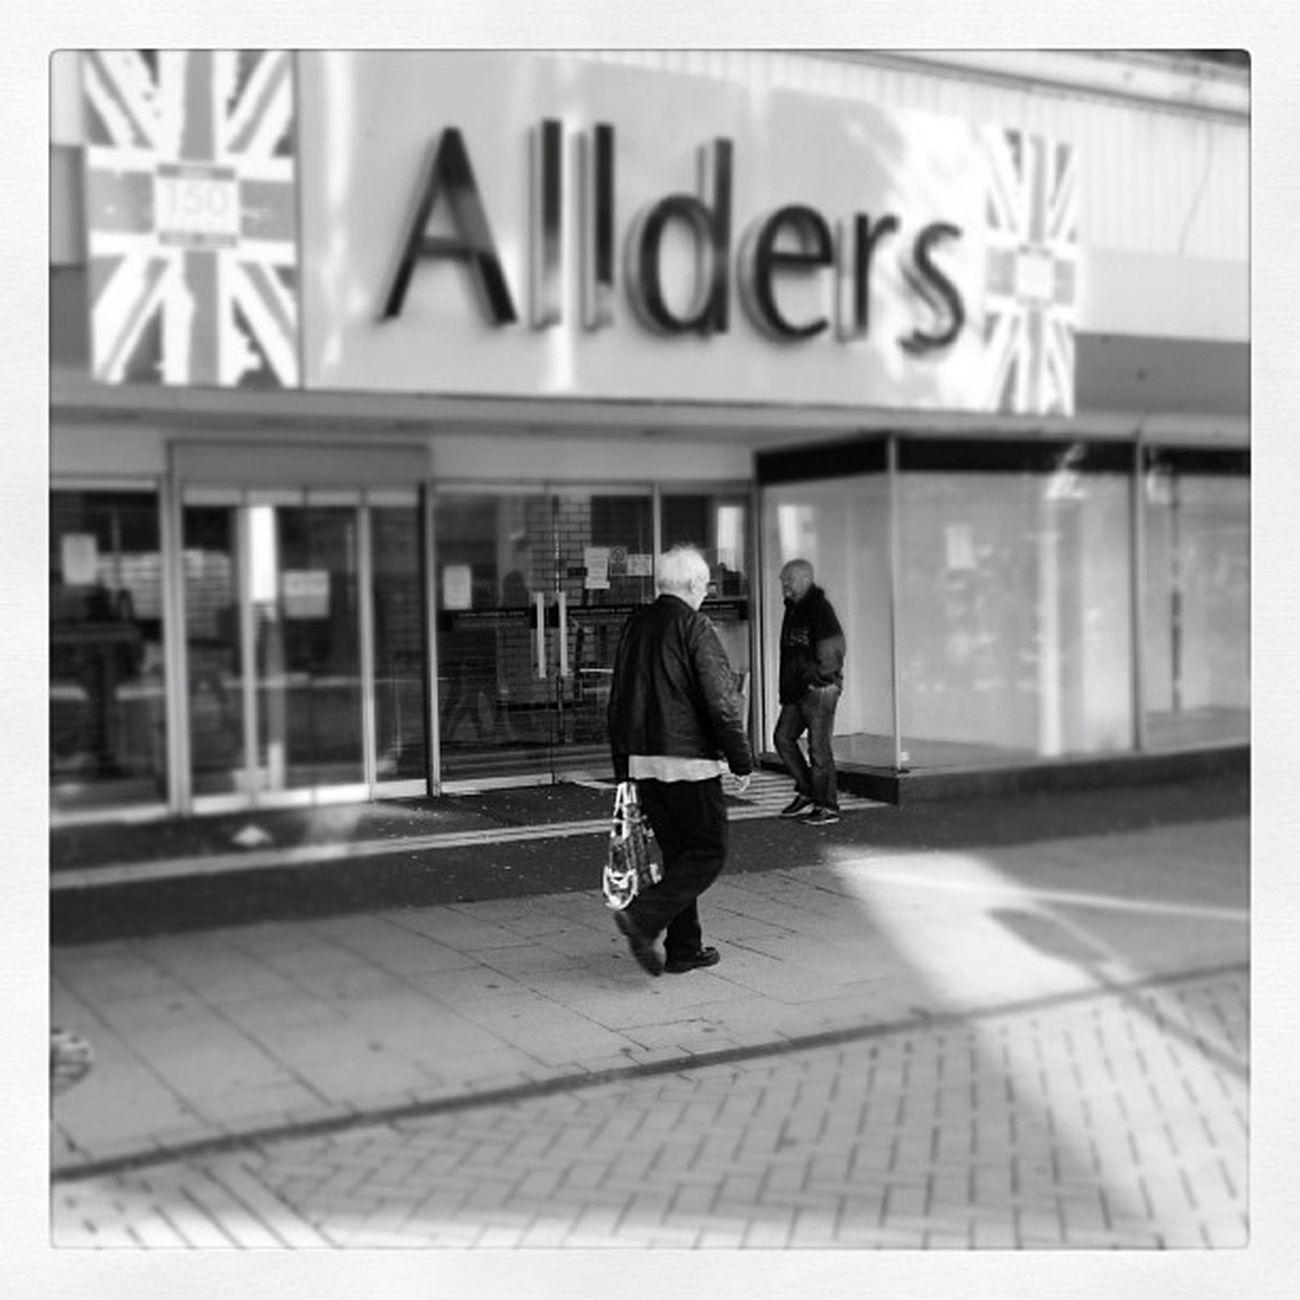 Allders Visionsofcroydon Allders Croydon Closure northend shop department store